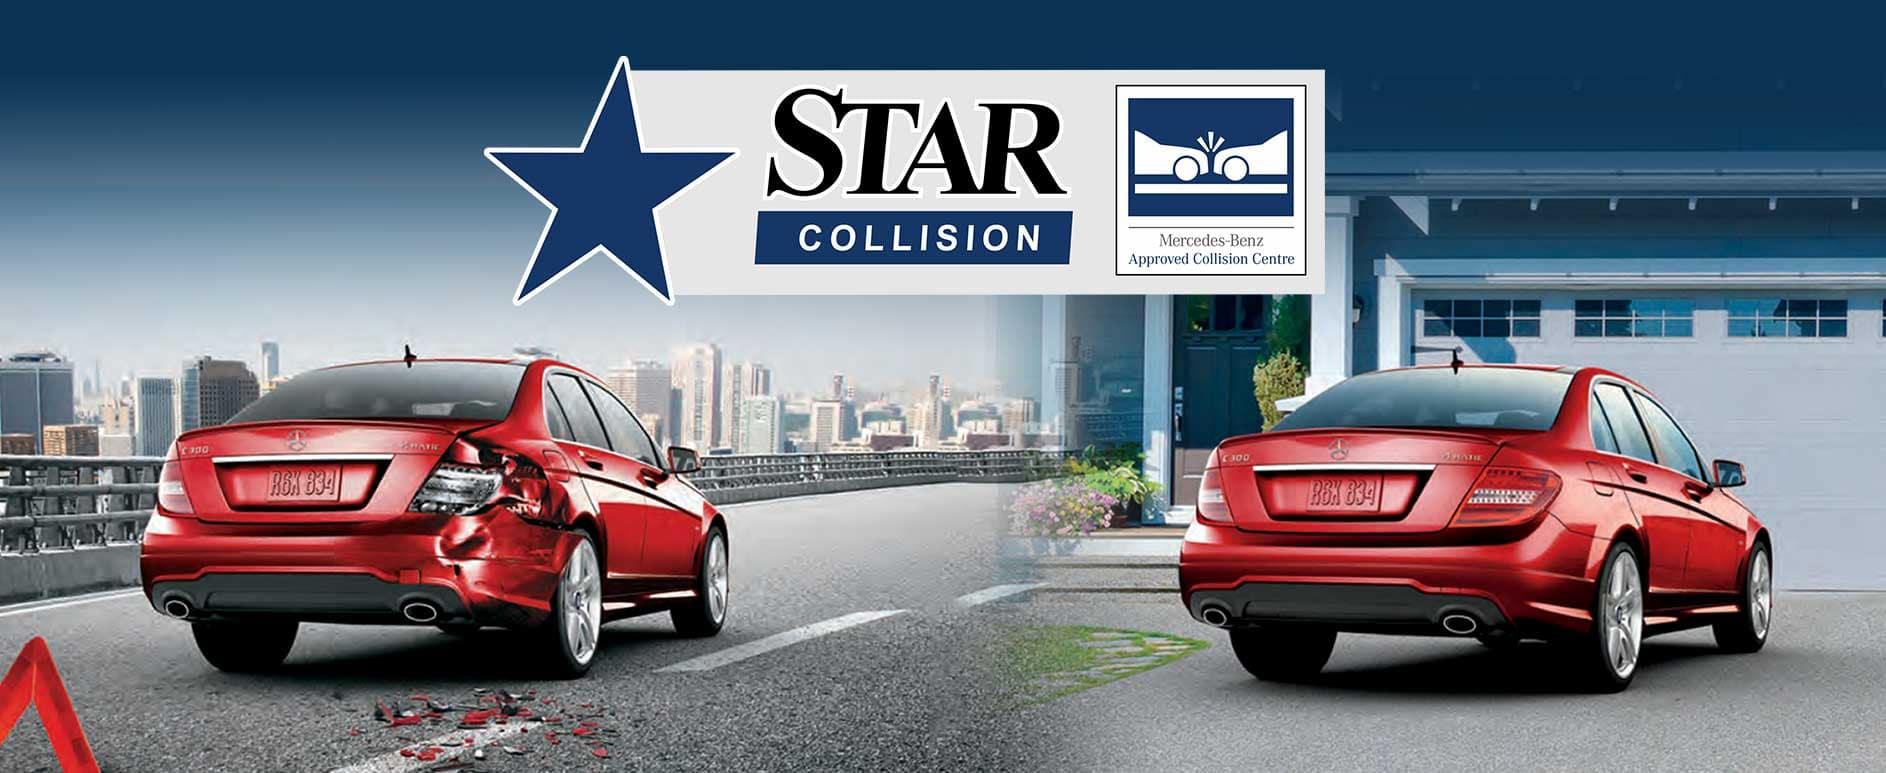 Star Motors Mercedes-Benz Collision Centre